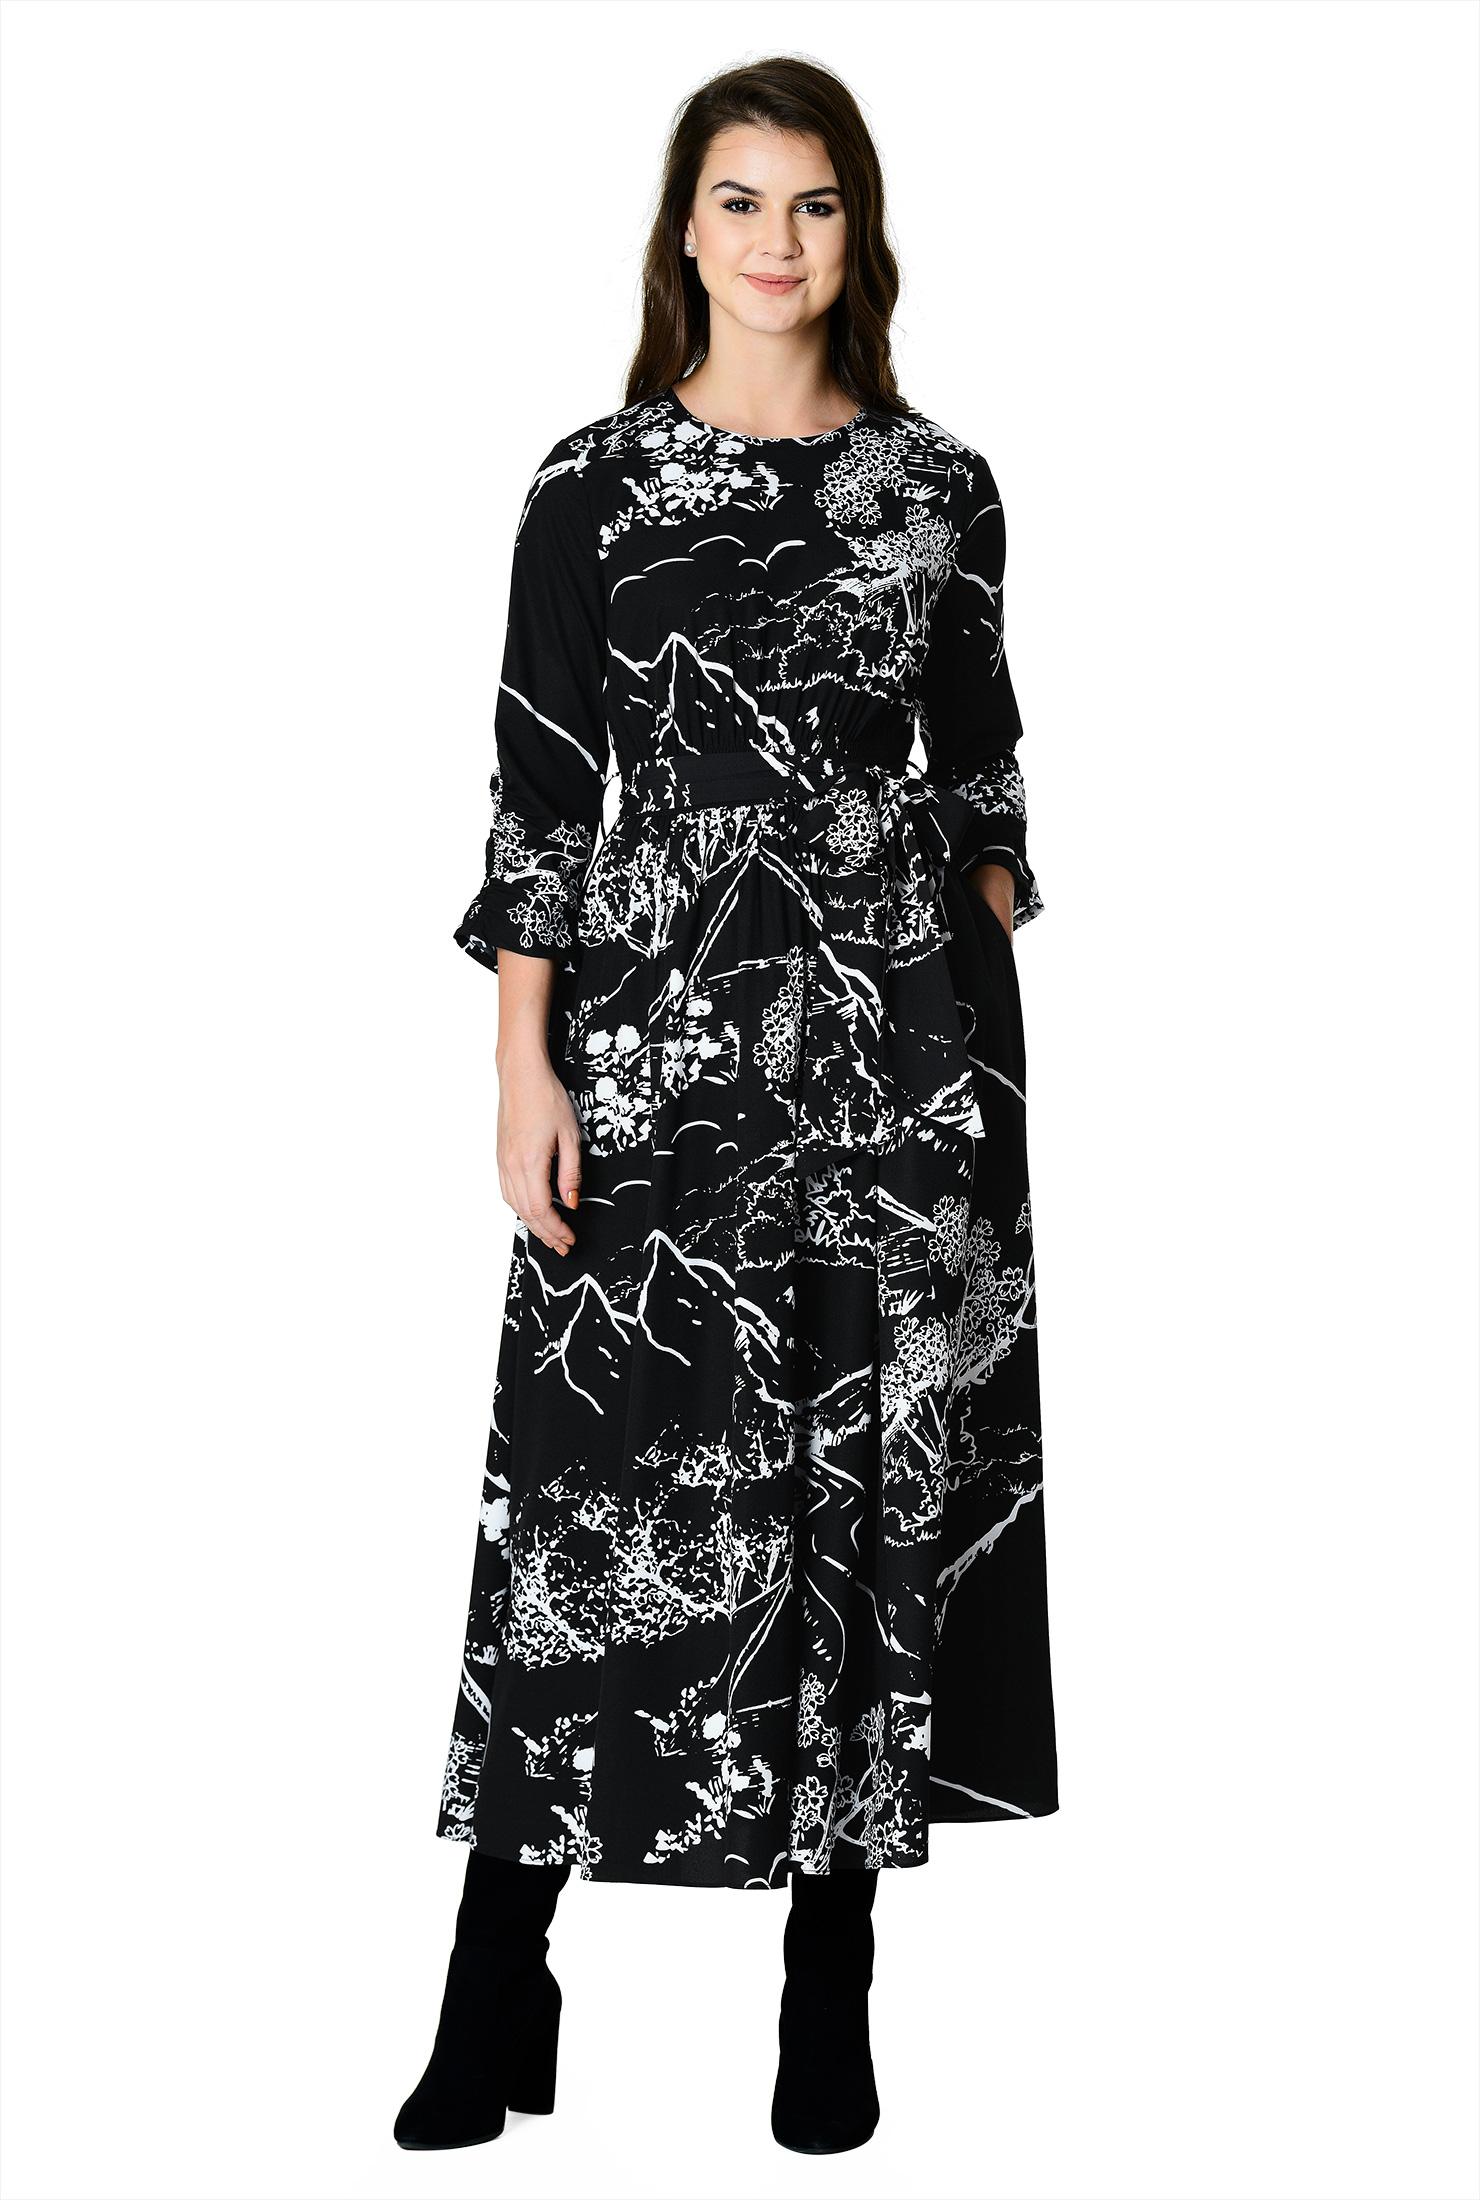 ccef53dd47 3/4 Length Sleeve Dresses, 4